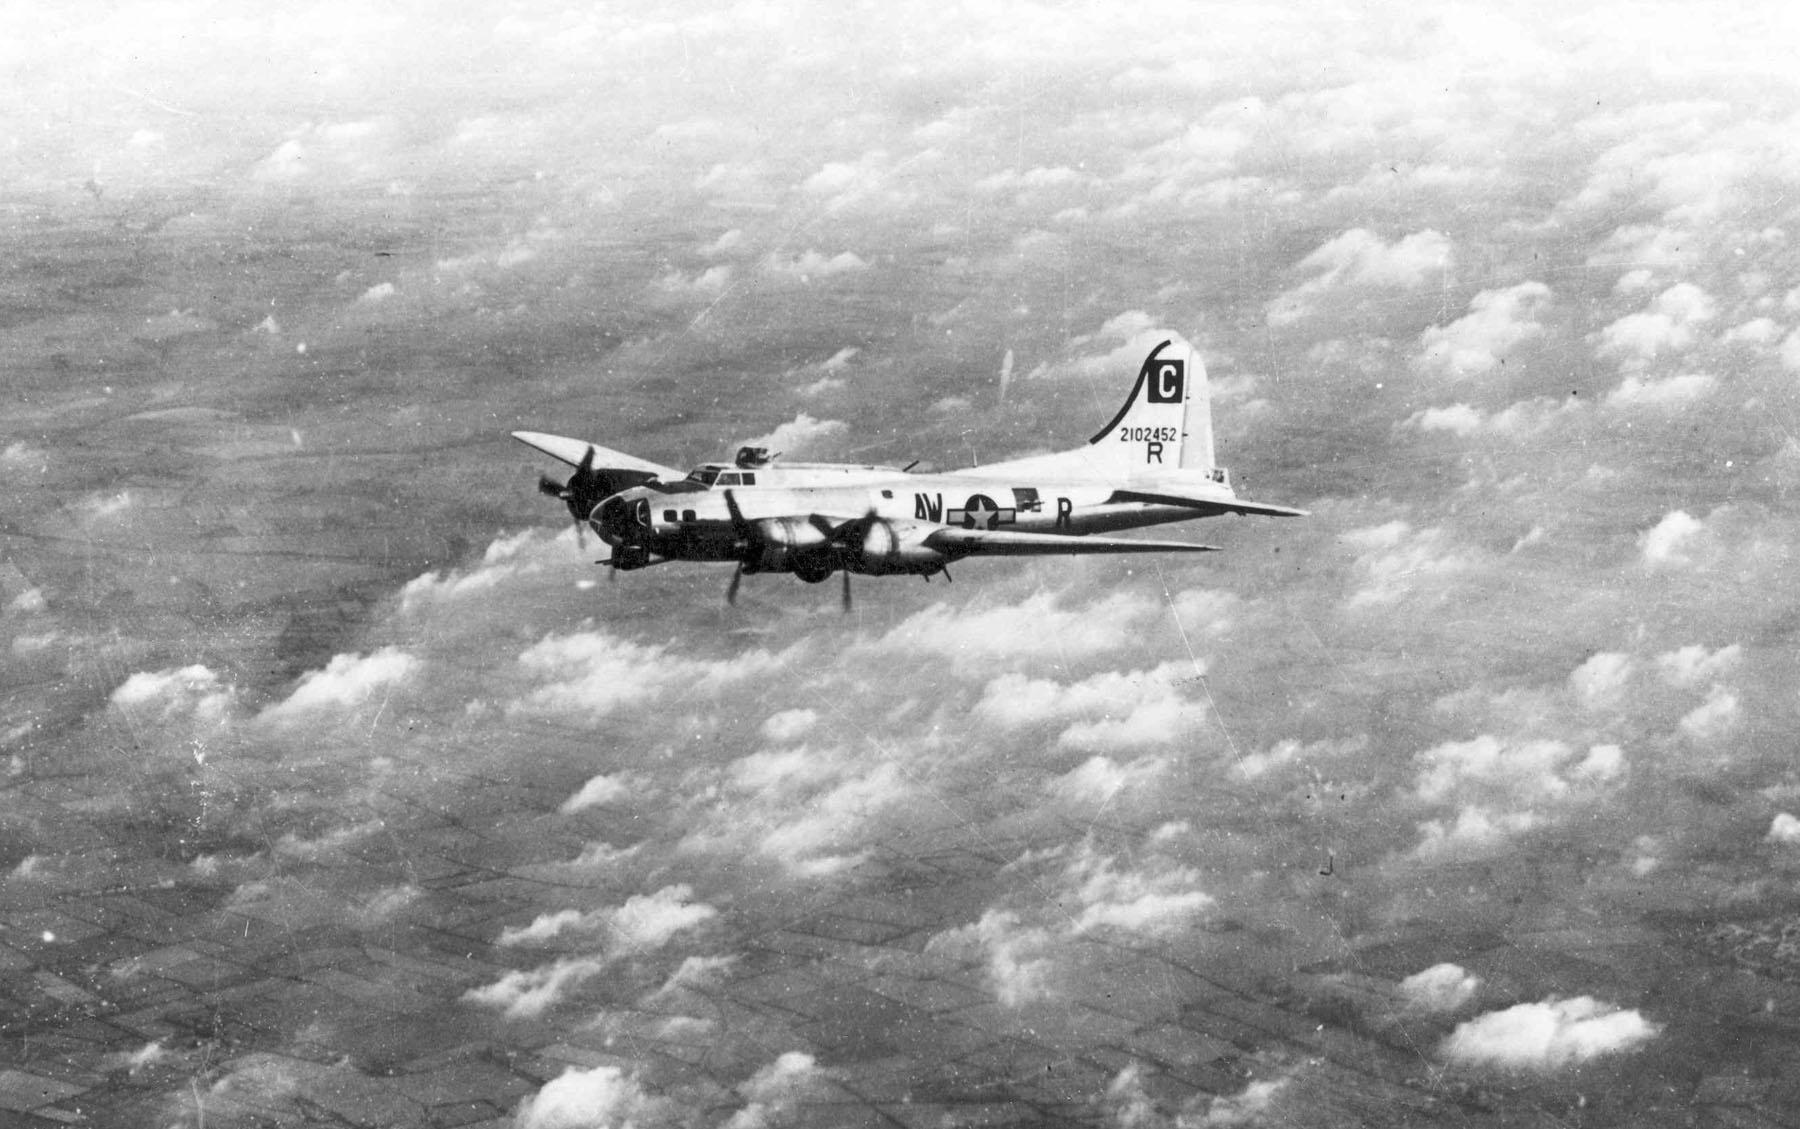 B-17 #42-102452